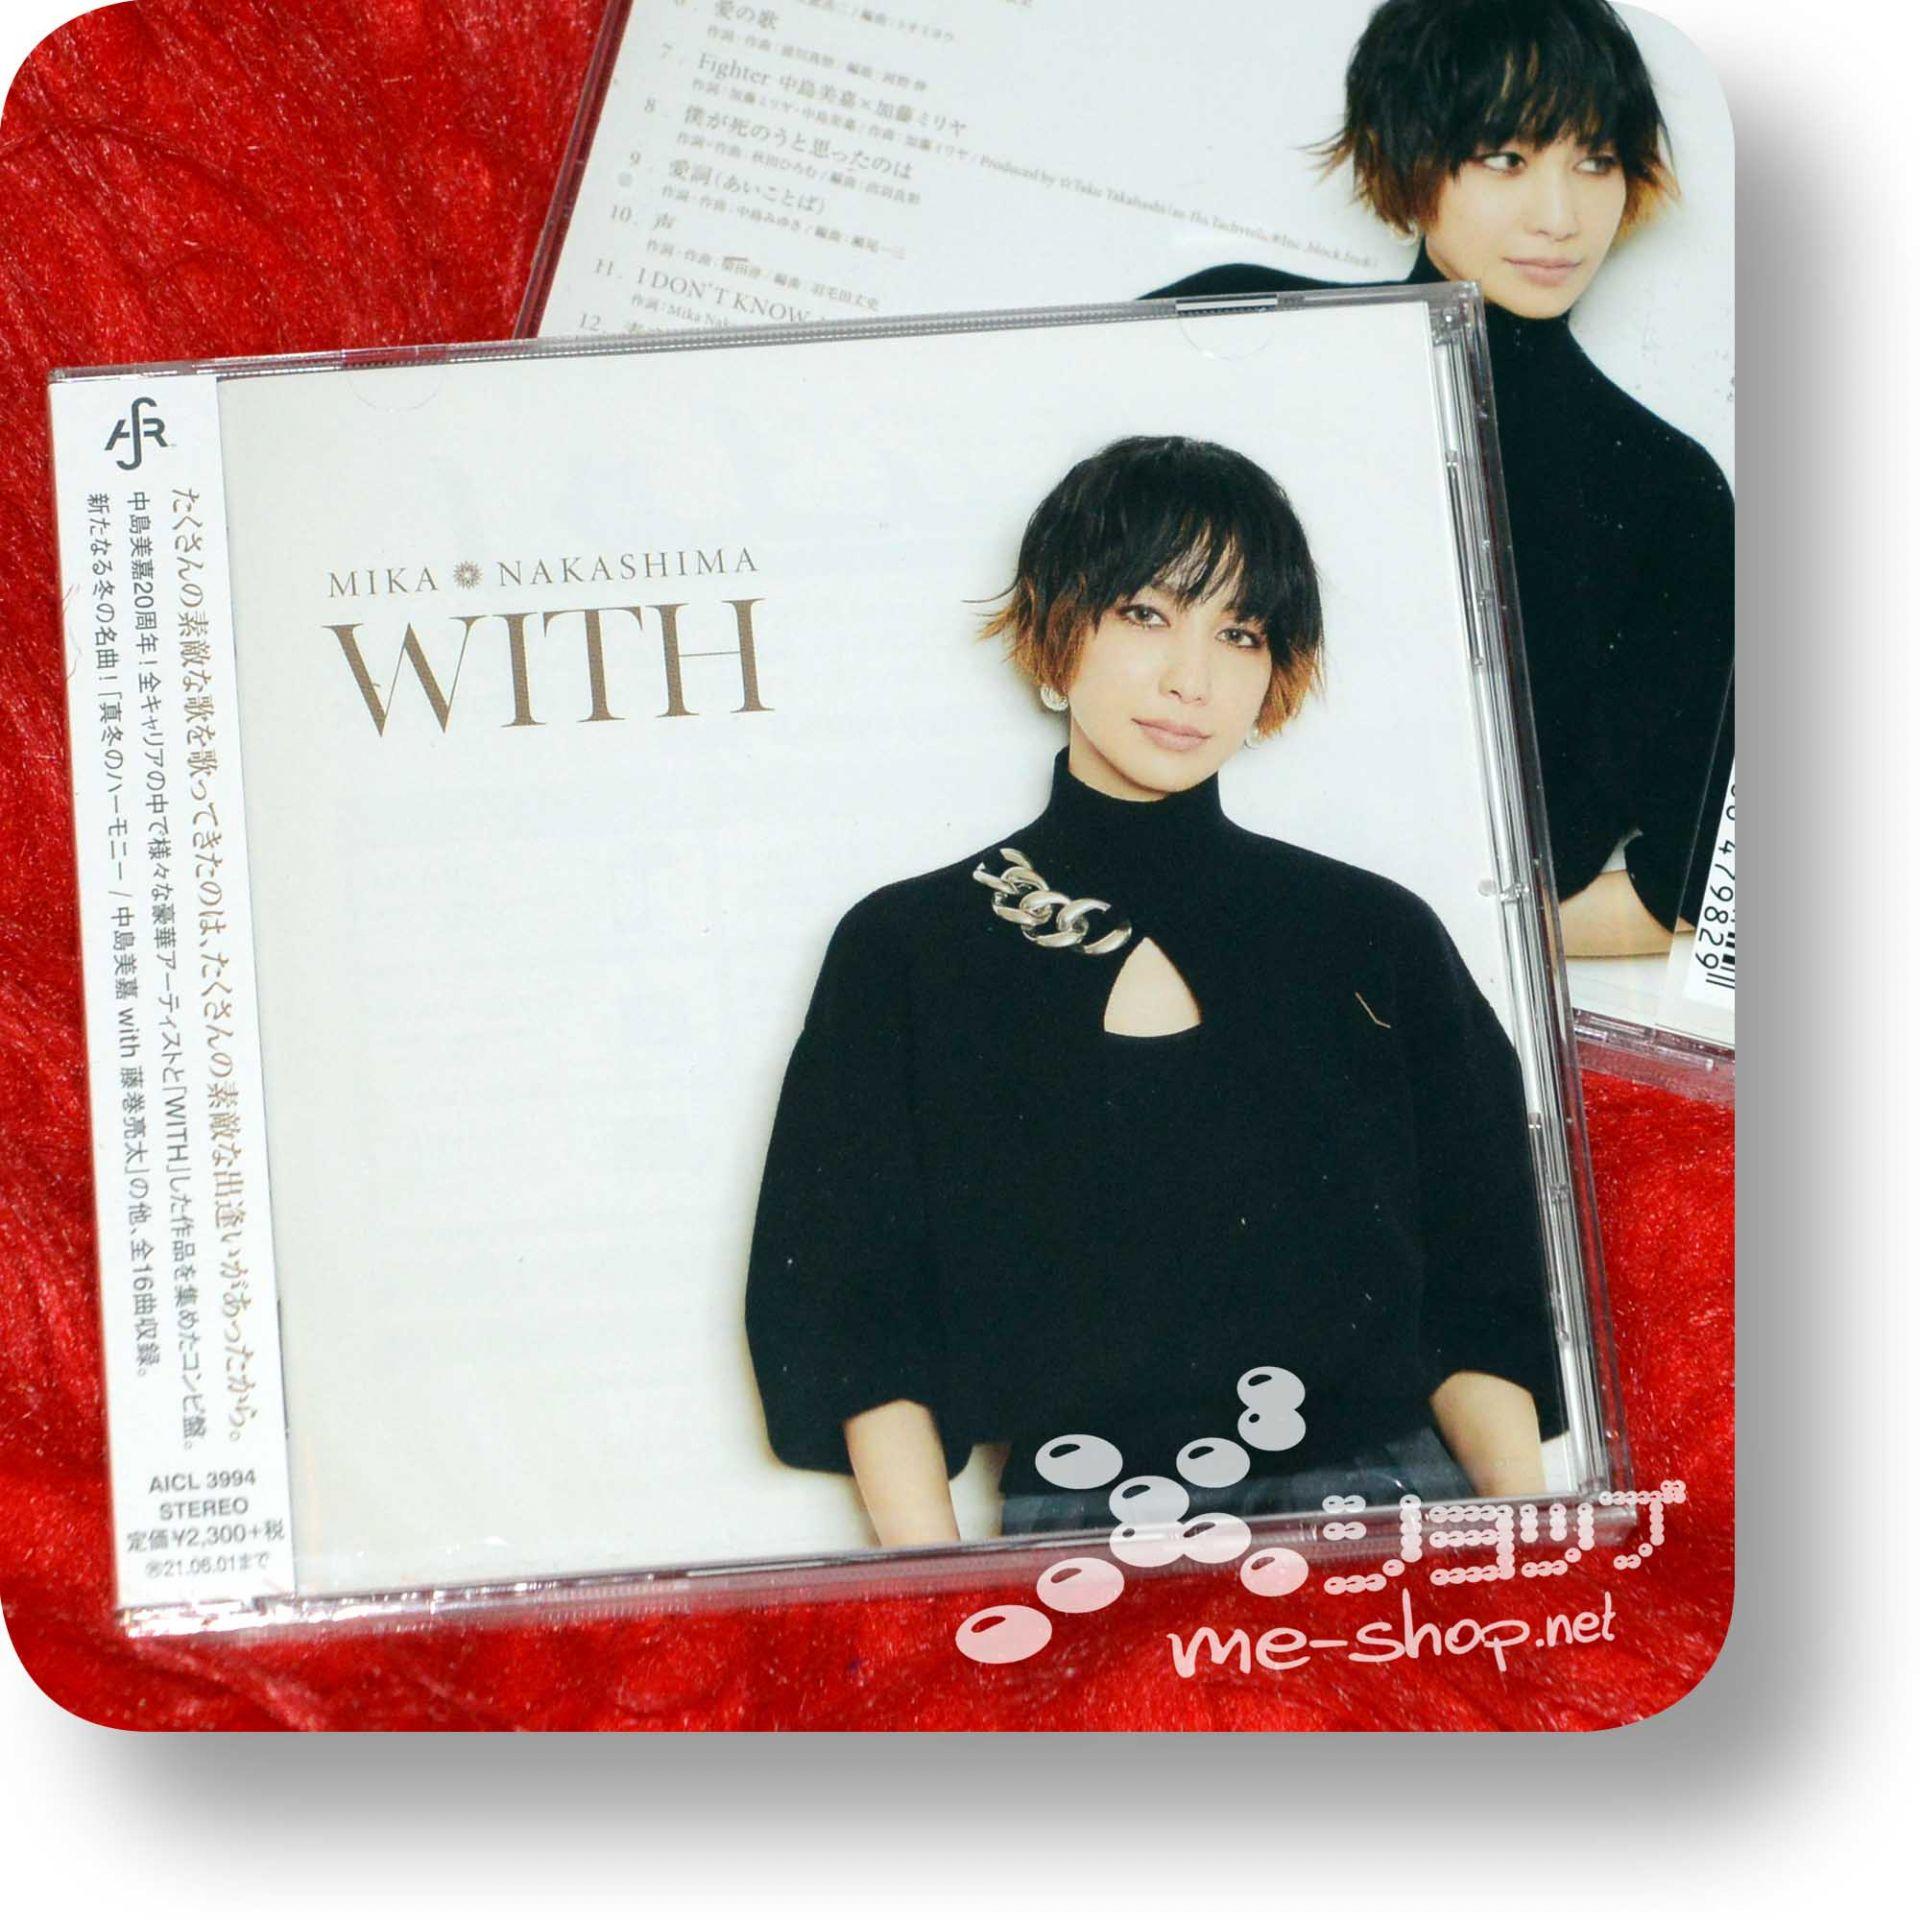 mika nakashima with